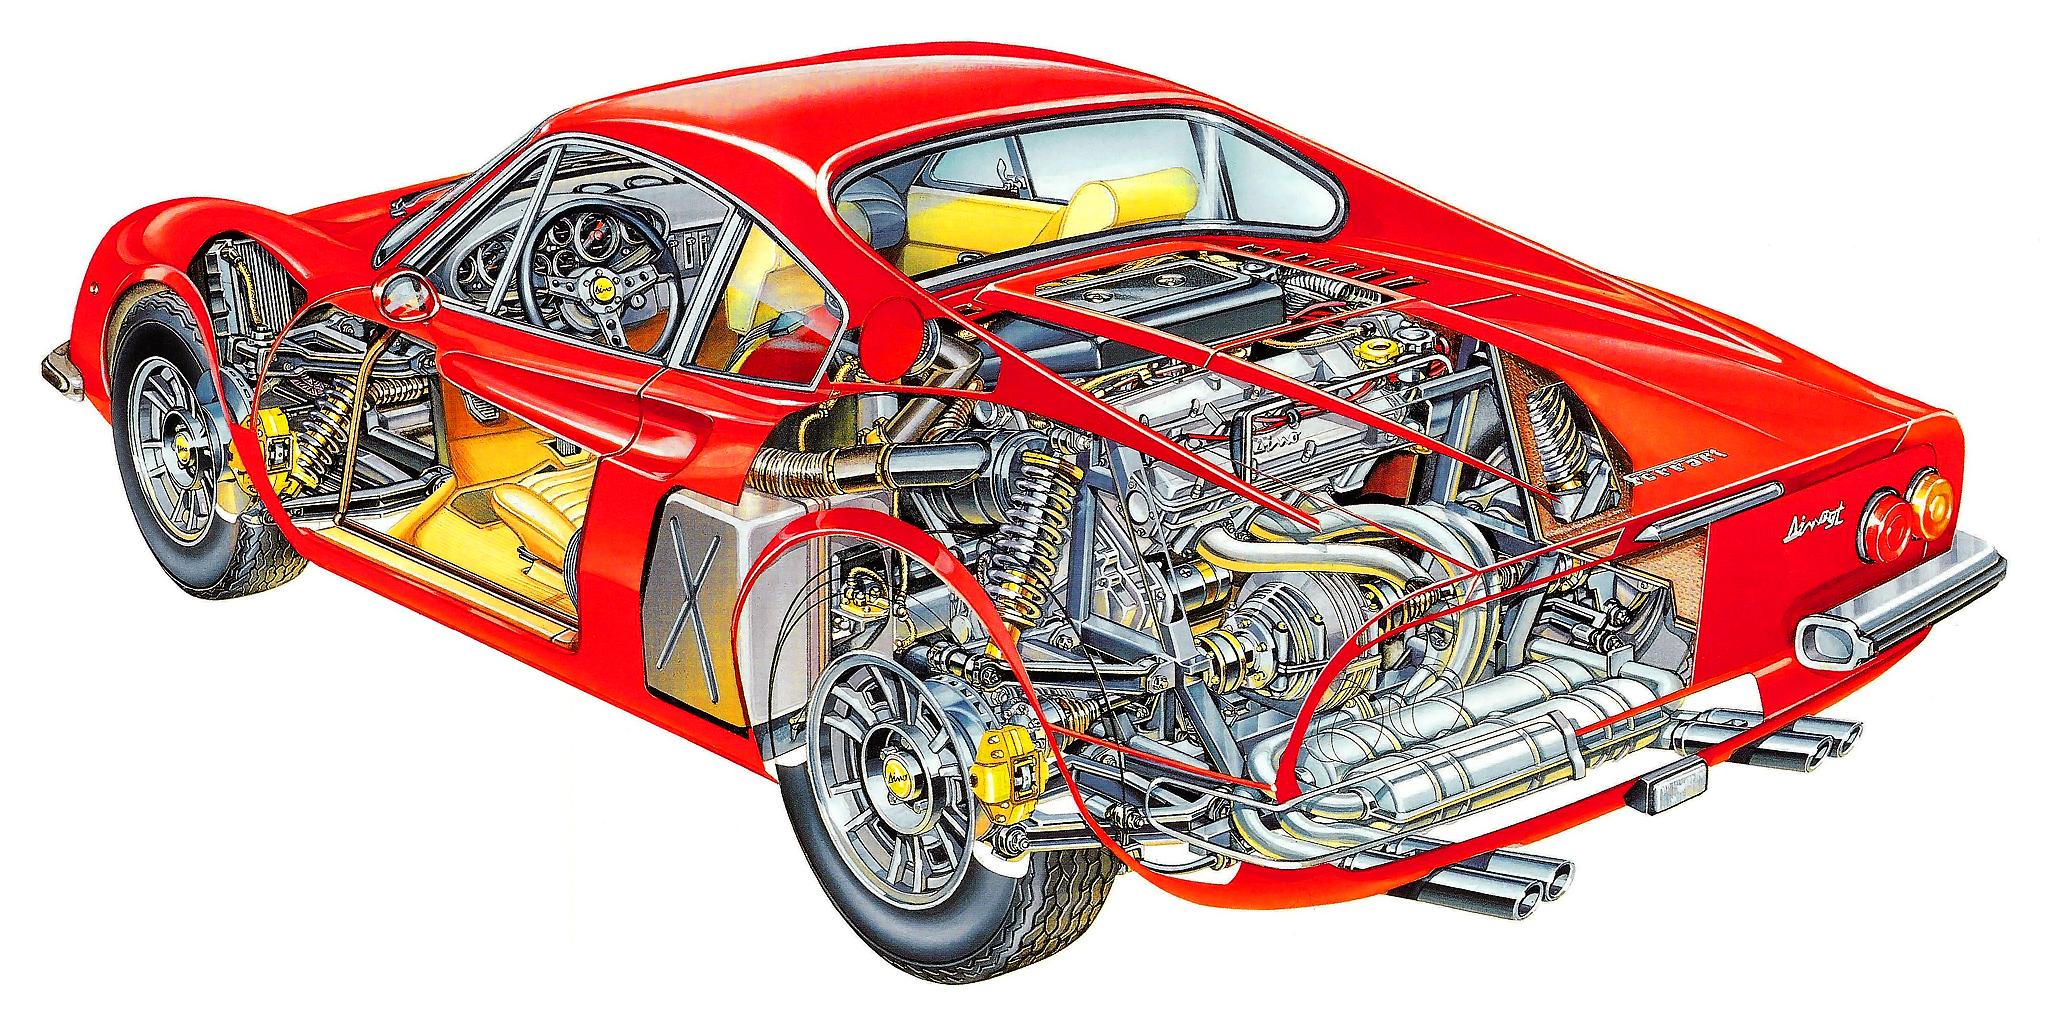 Giant test Ferrari Dino 246GT vs Porsche 911S - Drive on porsche macan, porsche replica cars, porsche women, porsche cabrio, porsche race girl, porsche art, porsche panamera, porsche gtp, porsche front, porsche cayenne, porsche gt4, porsche cayman, porsche calendar girls, porsche hd, porsche hatchback, porsche boxster, porsche future models, porsche electric car, porsche gt,